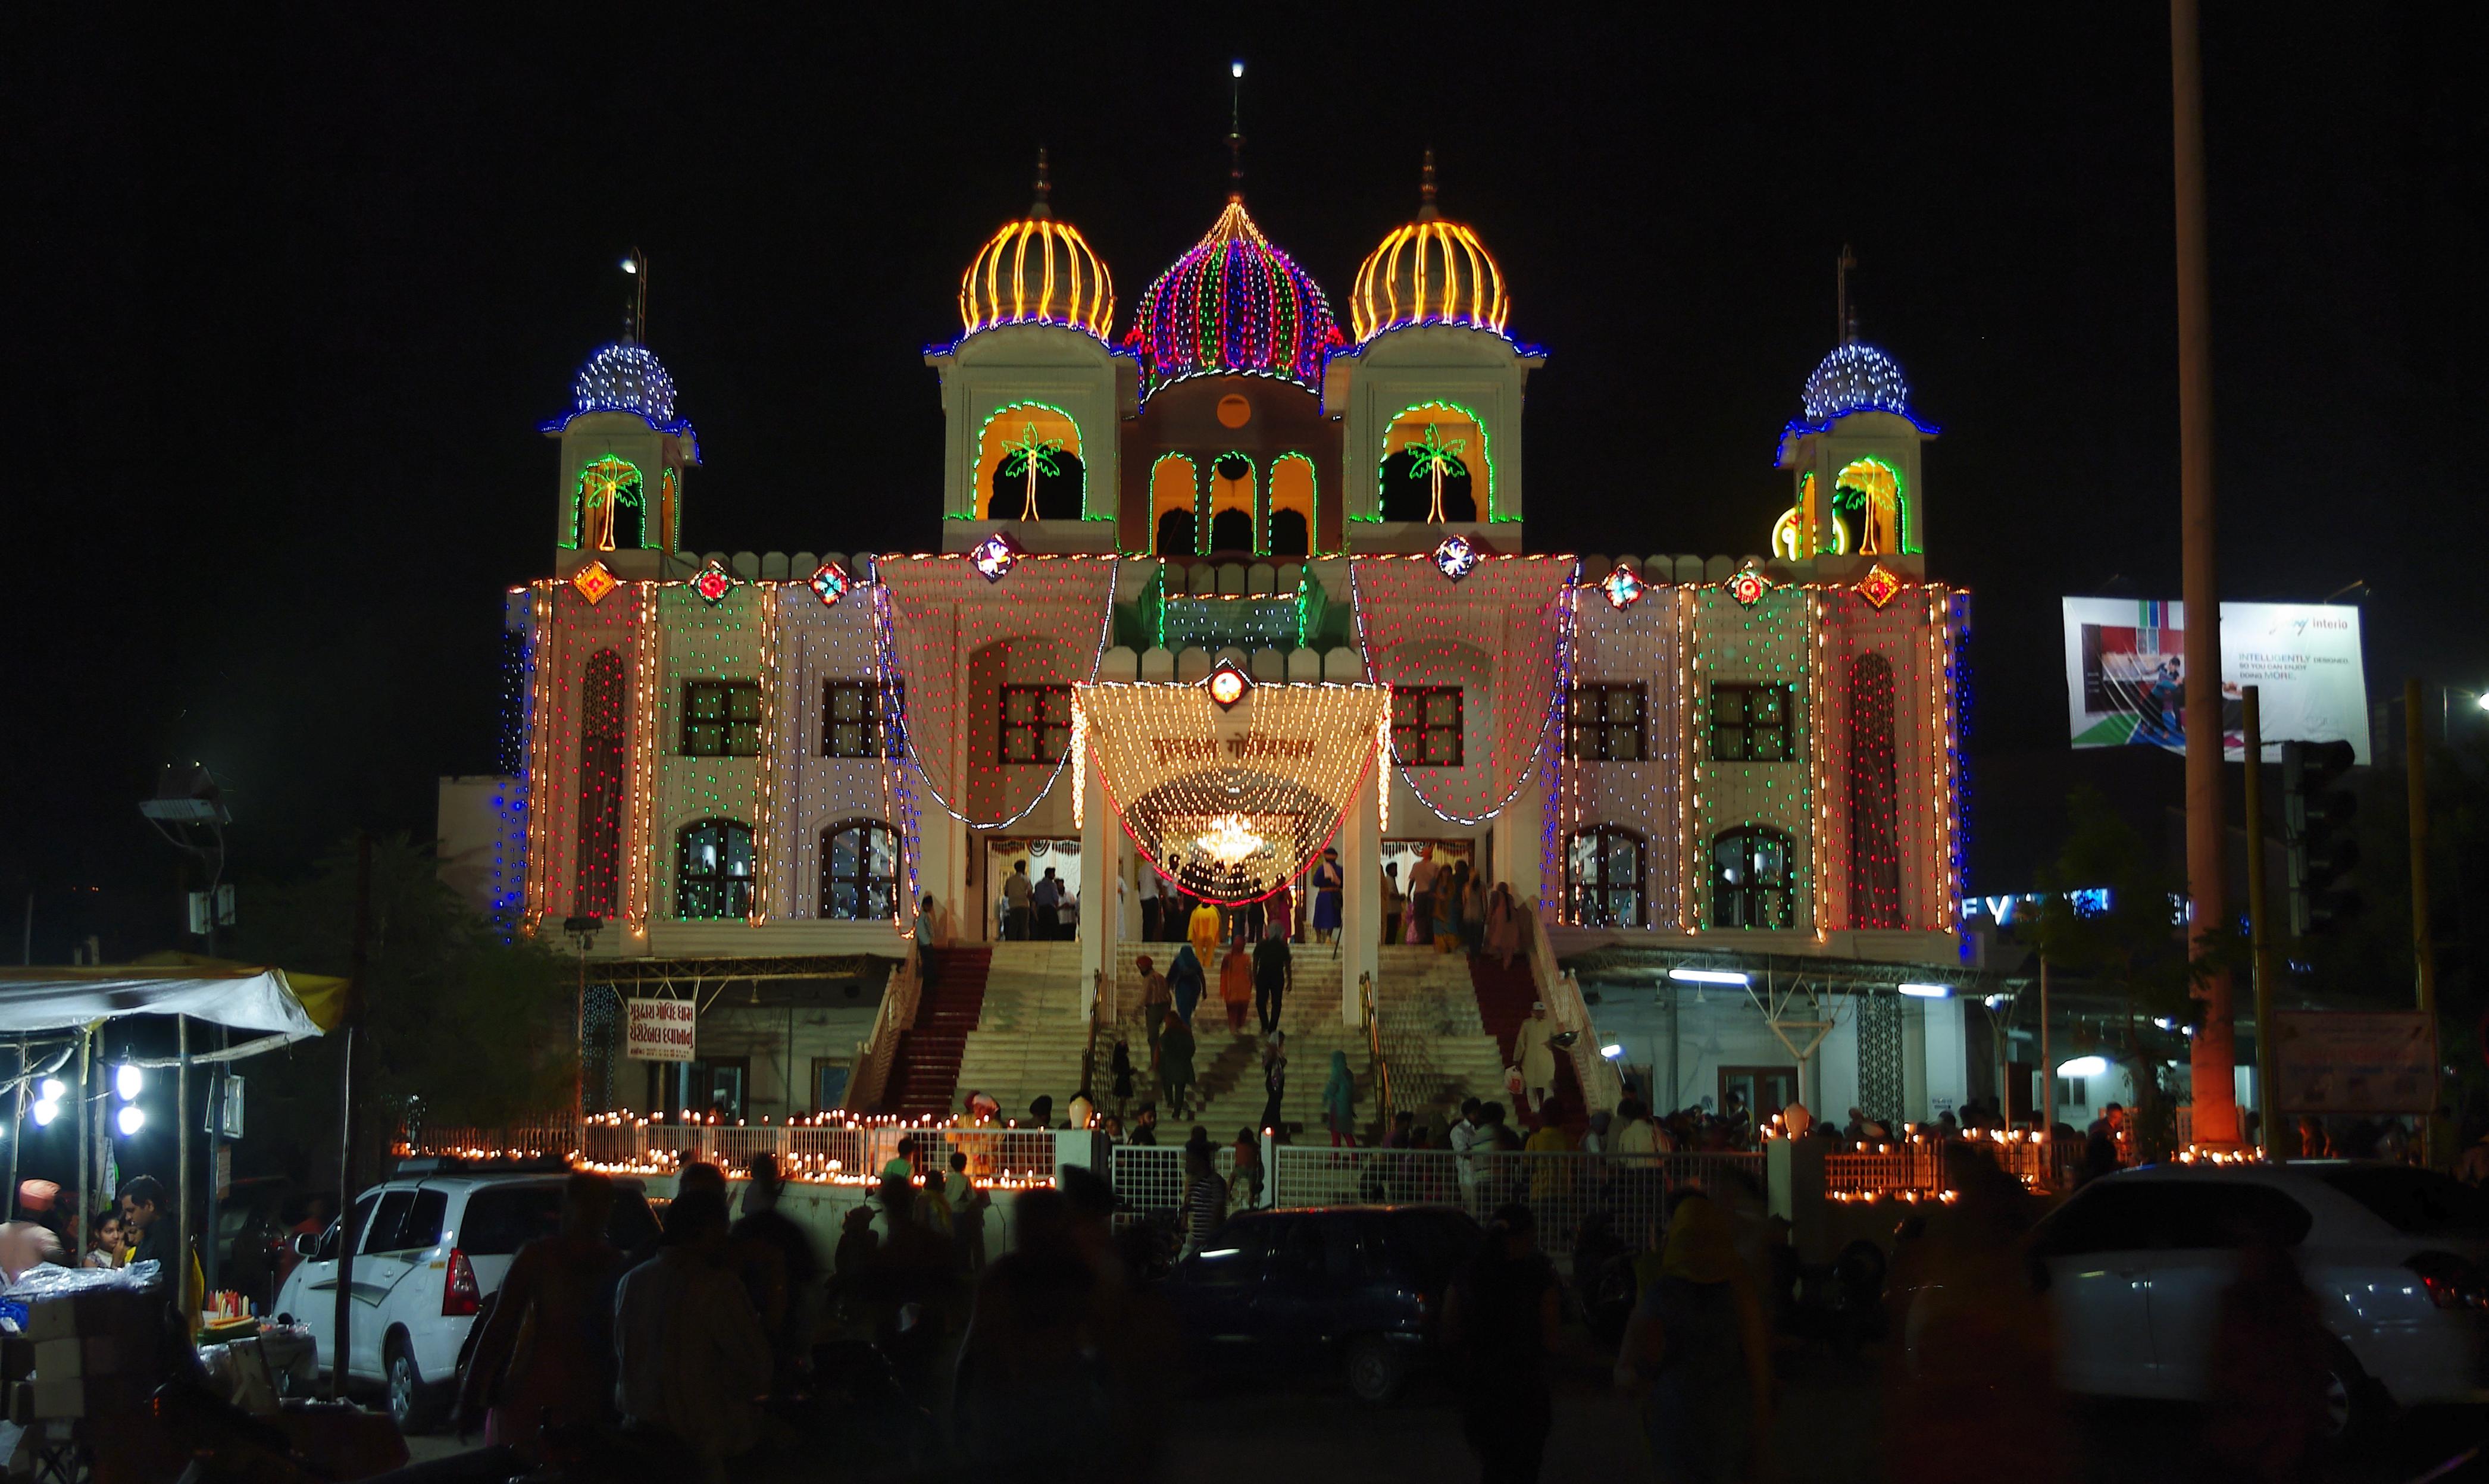 Ahmedabad India  city photos gallery : Diwali Lighting in Ahmedabad, India 2009 Wikimedia Commons